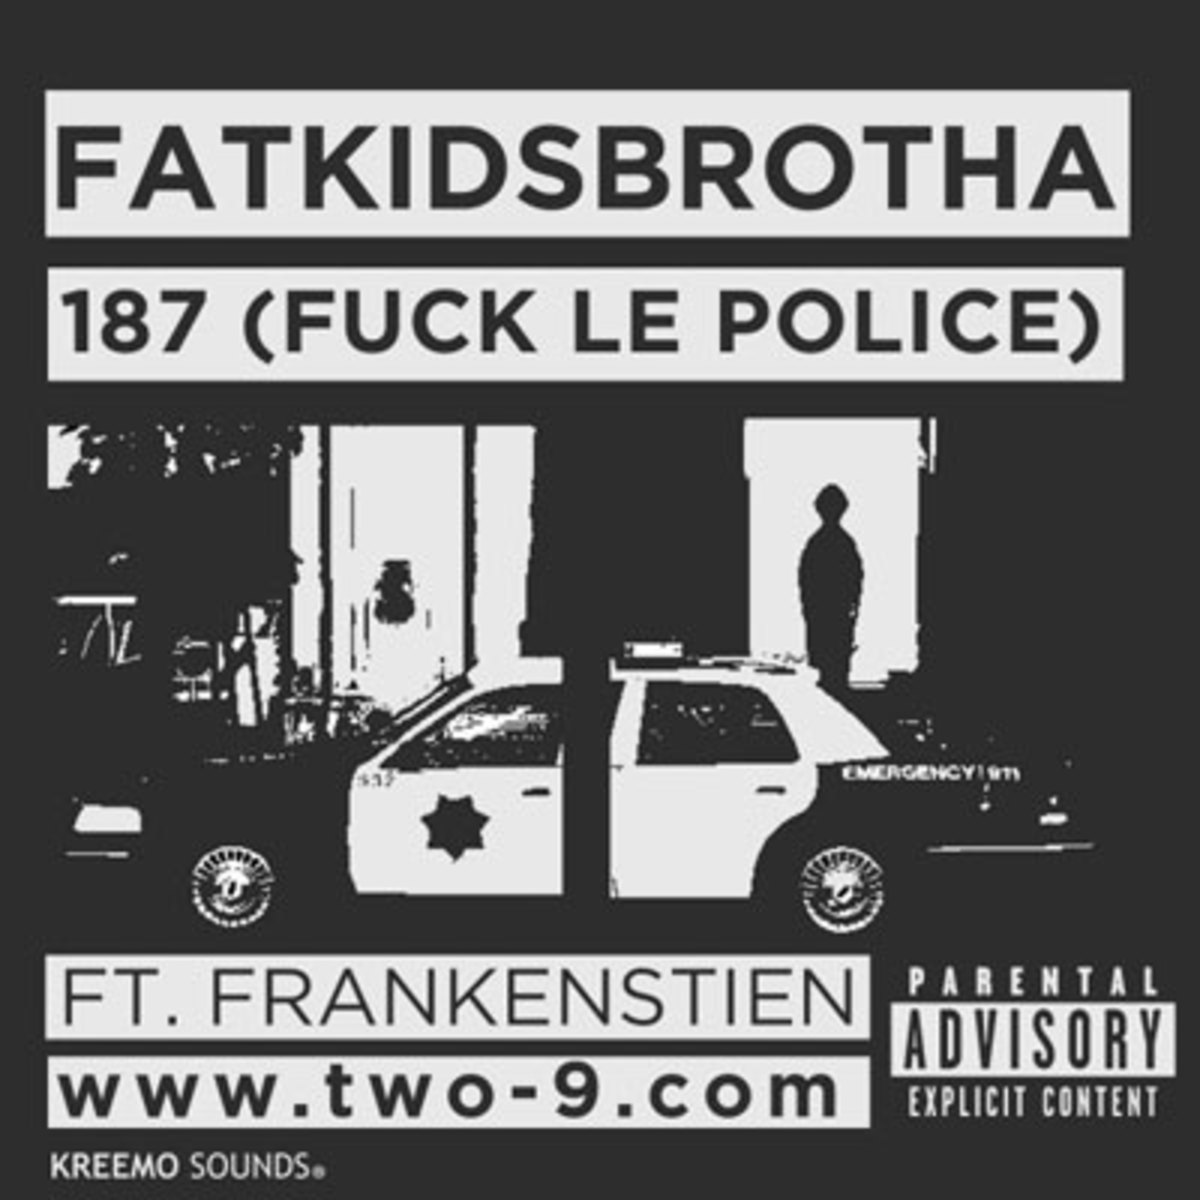 fatkidsbrotha-187.jpg